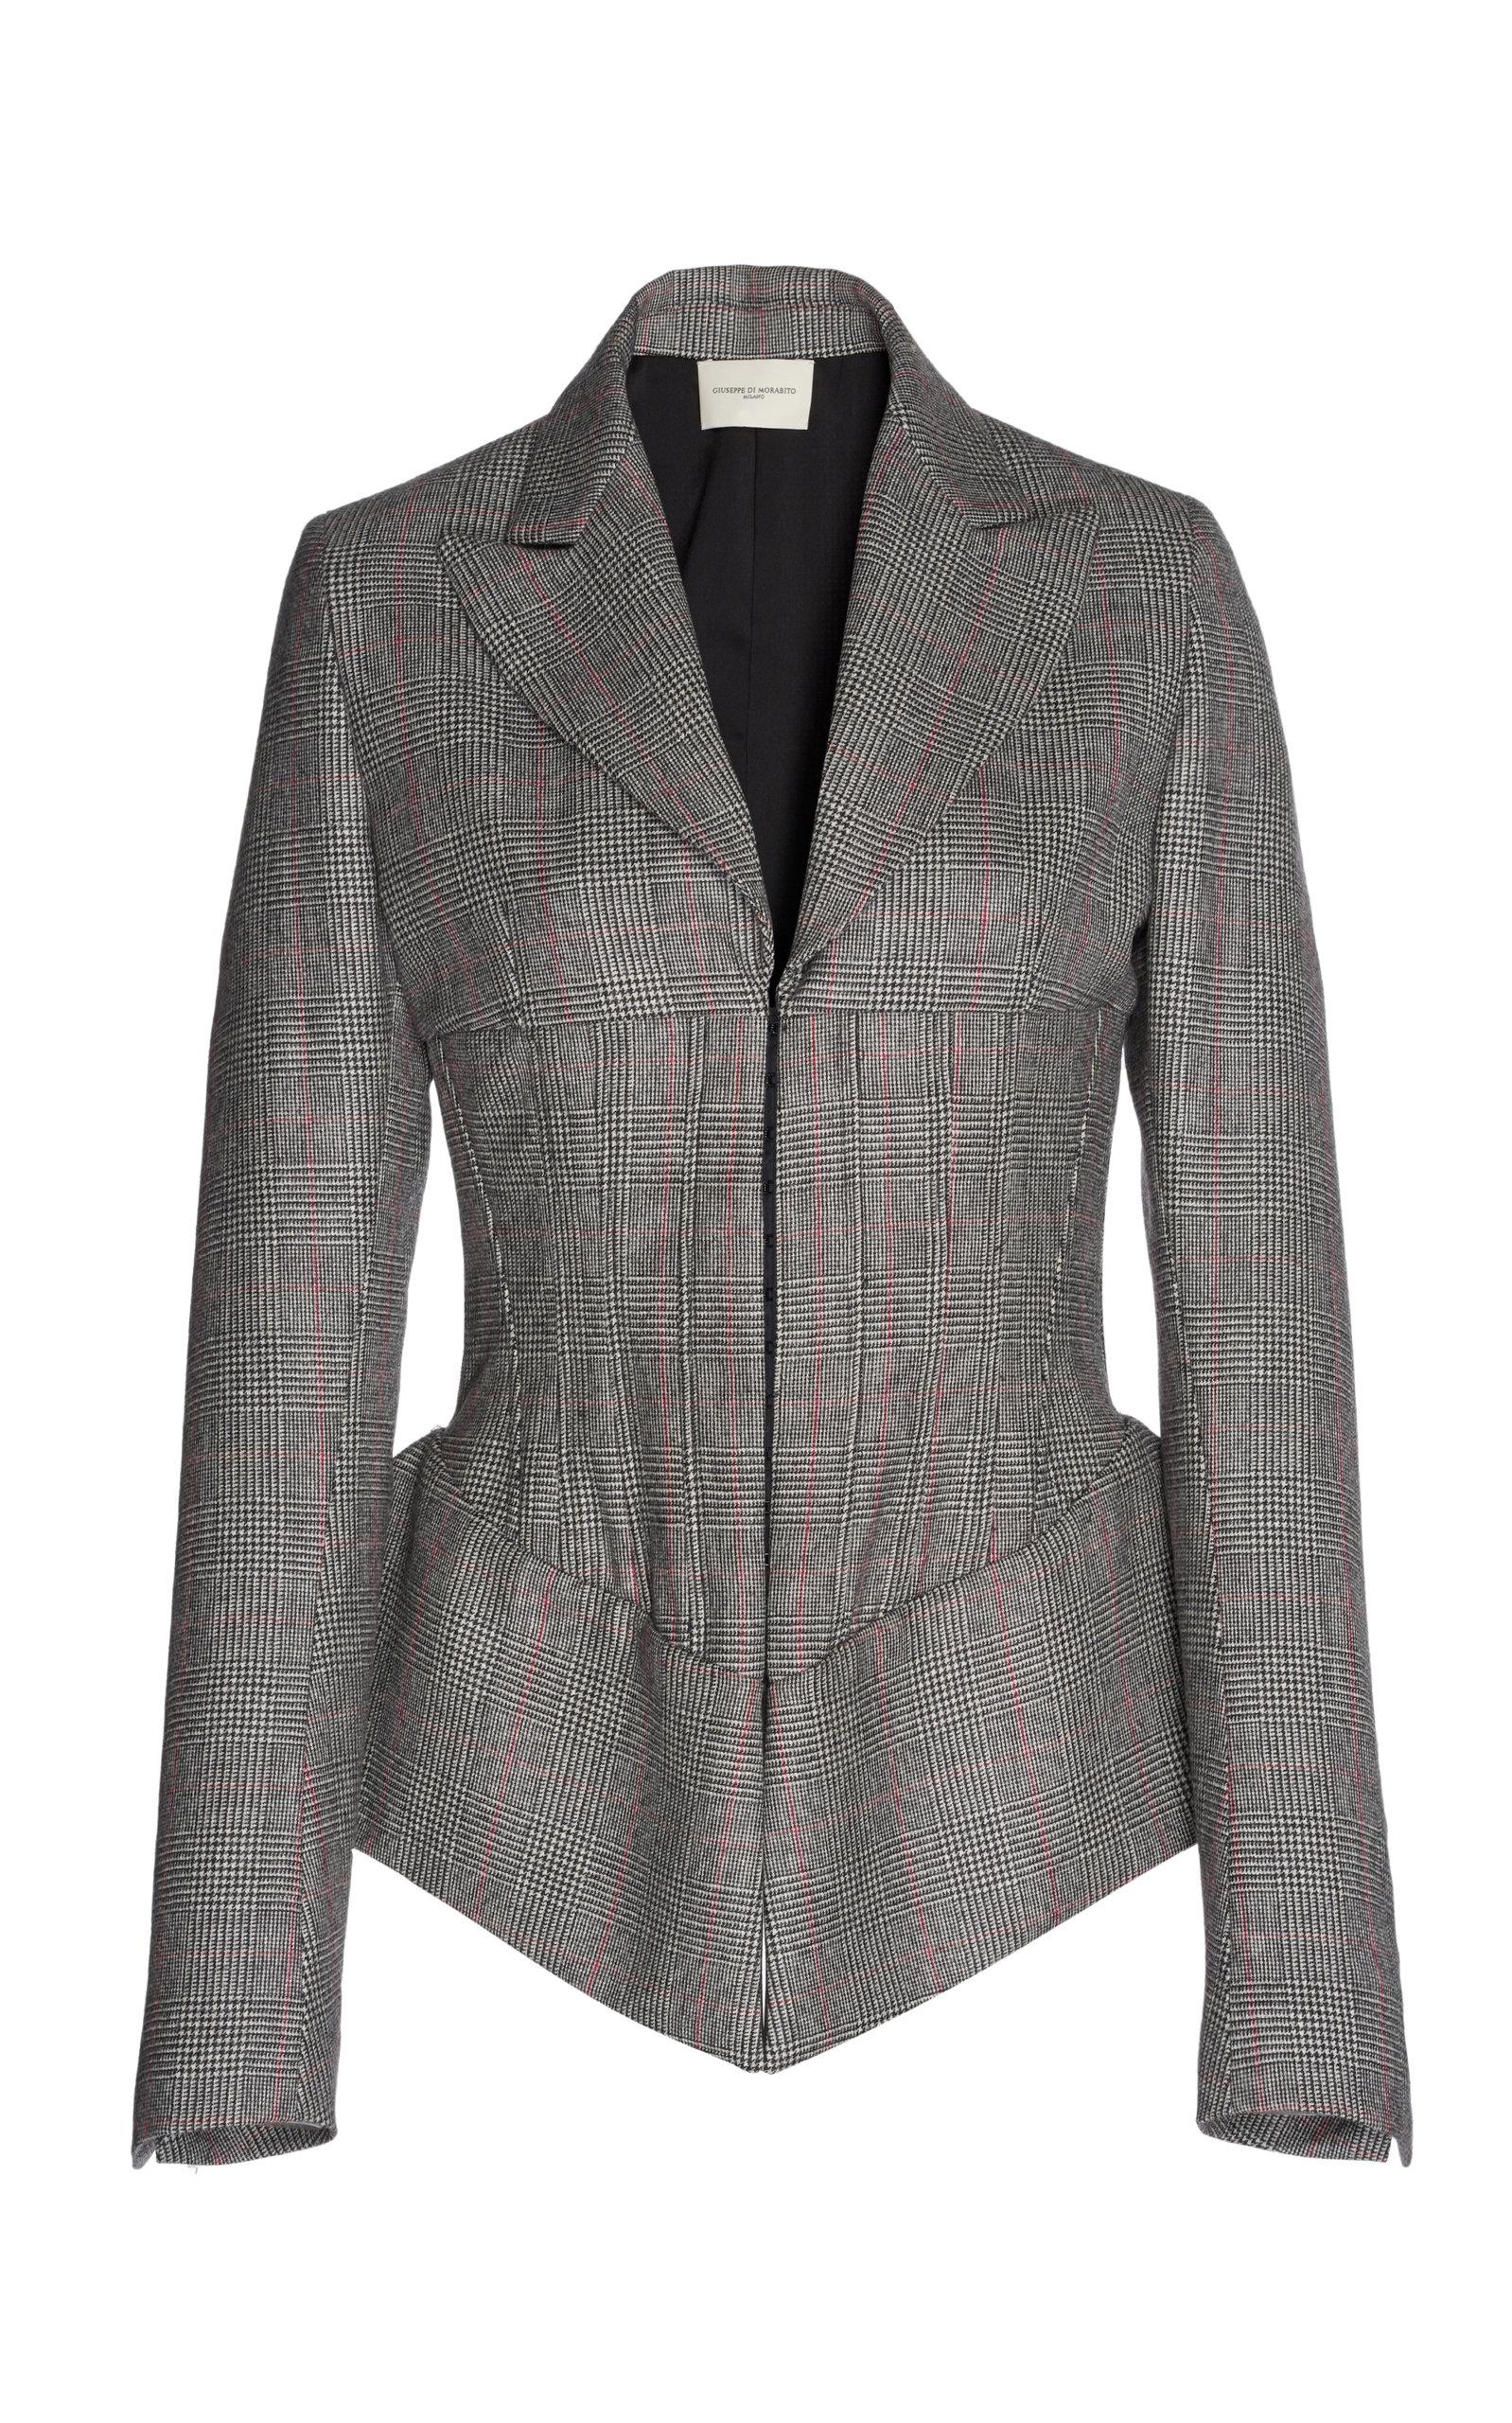 GIUSEPPE DI MORABITO Check Bustier Jacket in Grey